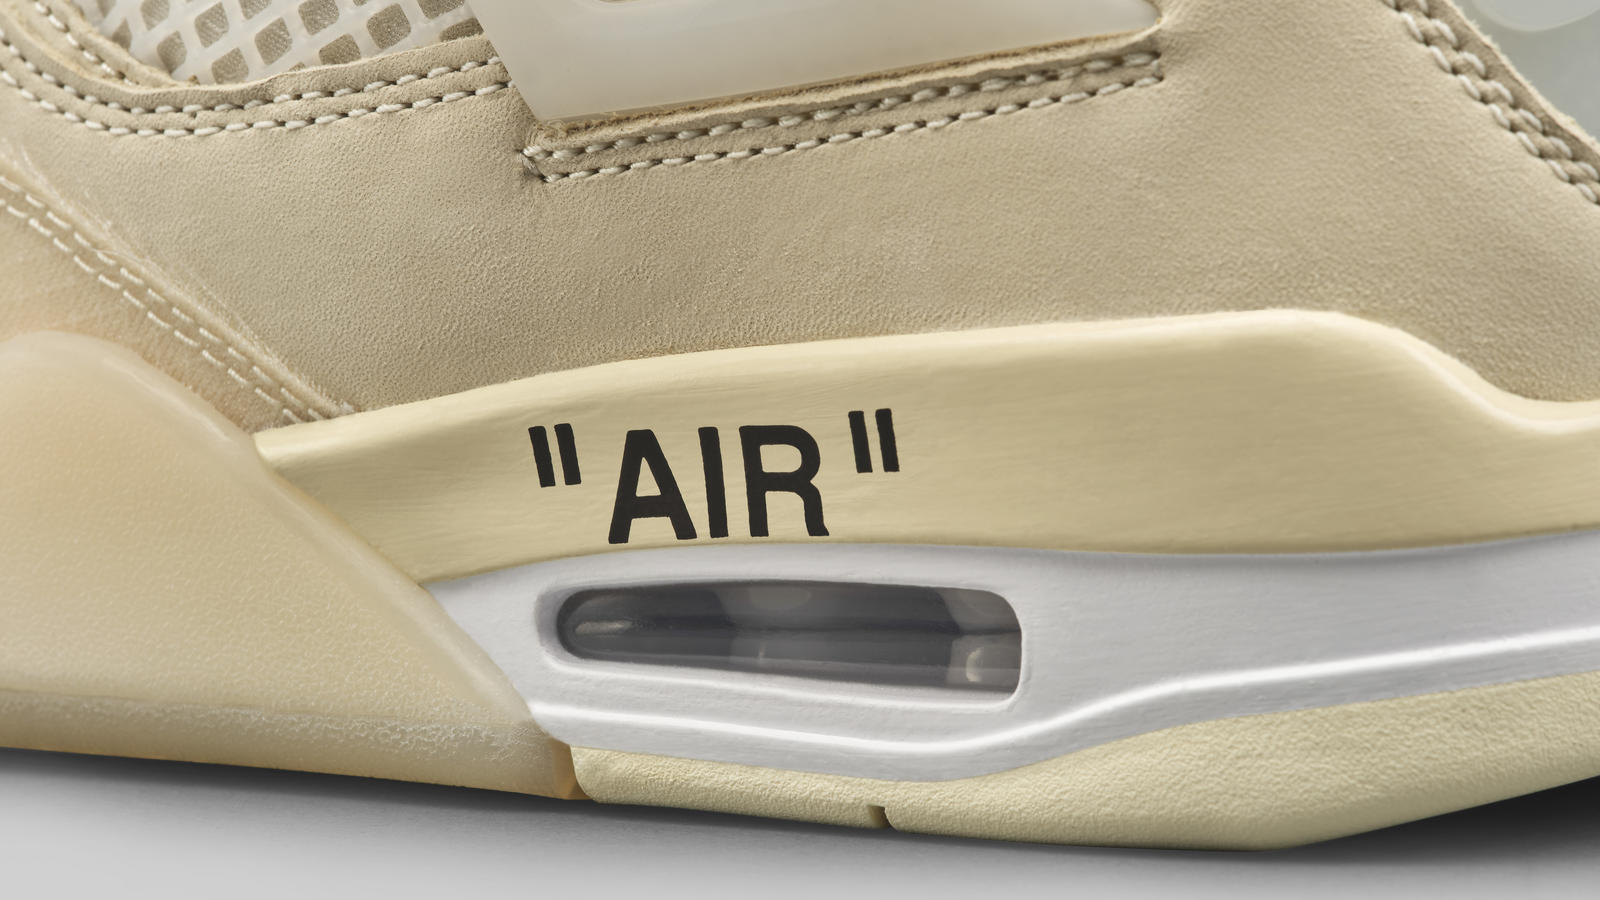 Jordan Brand Virgil Abloh Women's Air Jordan IV 11